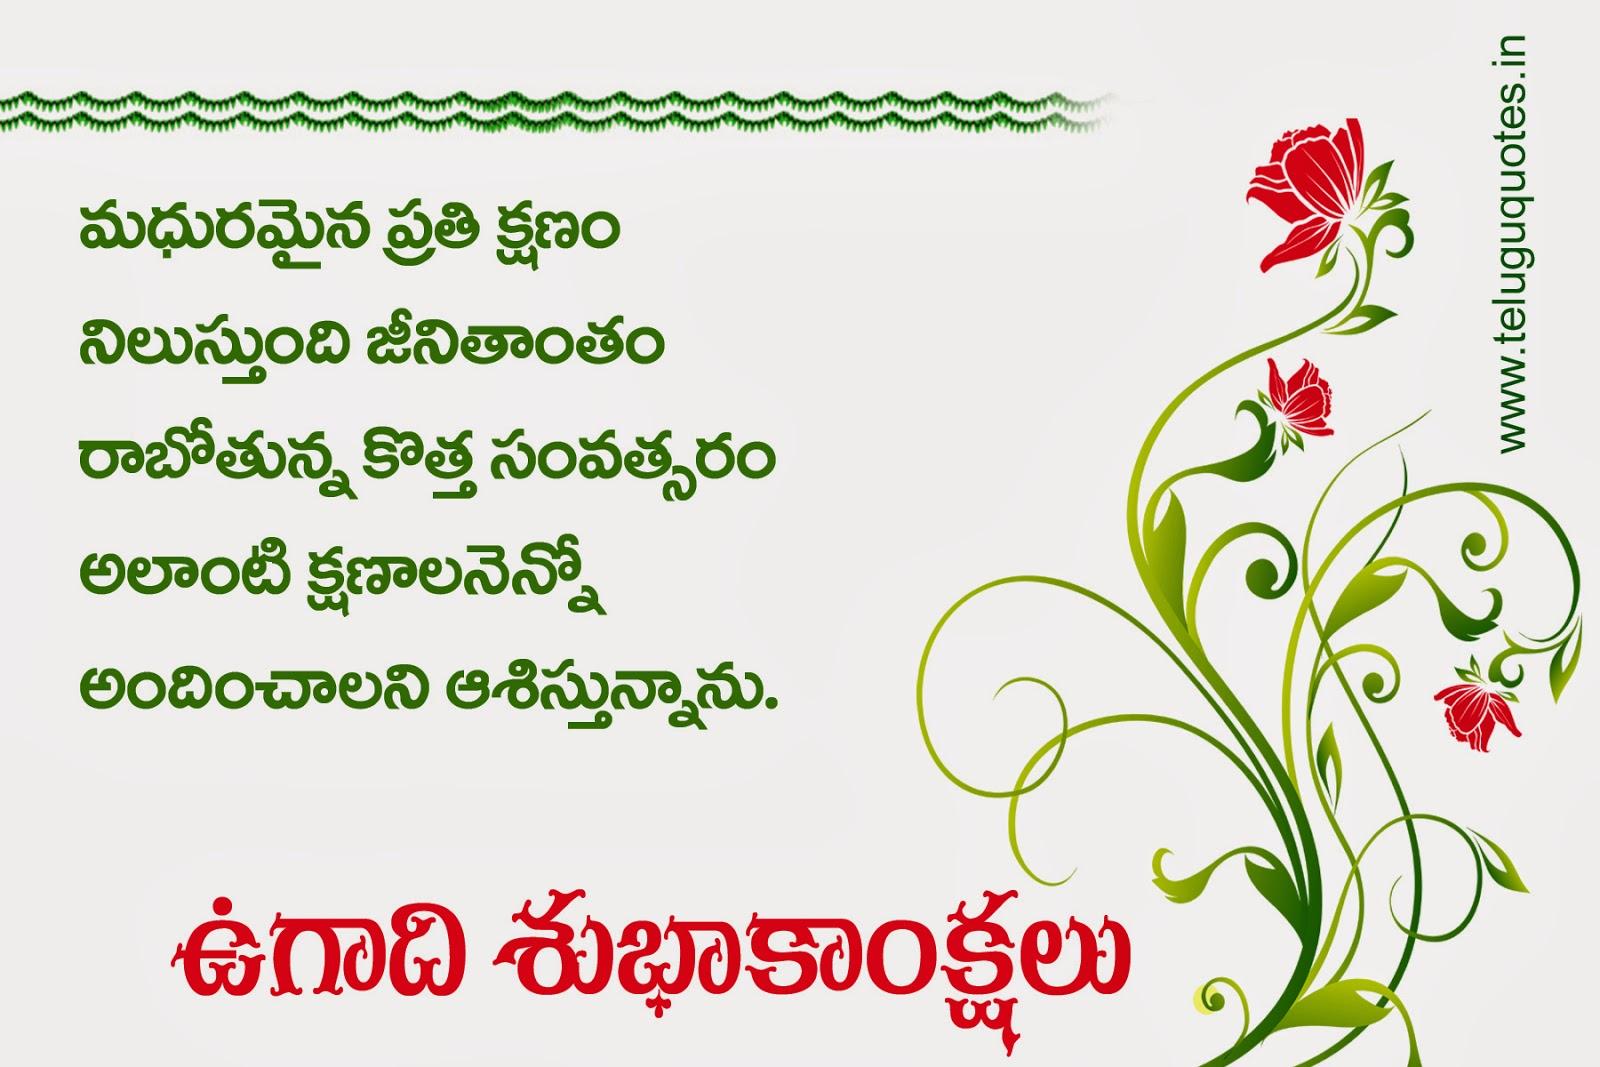 Ugadi 2014 Telugu Date Ugadi Greetings Images...